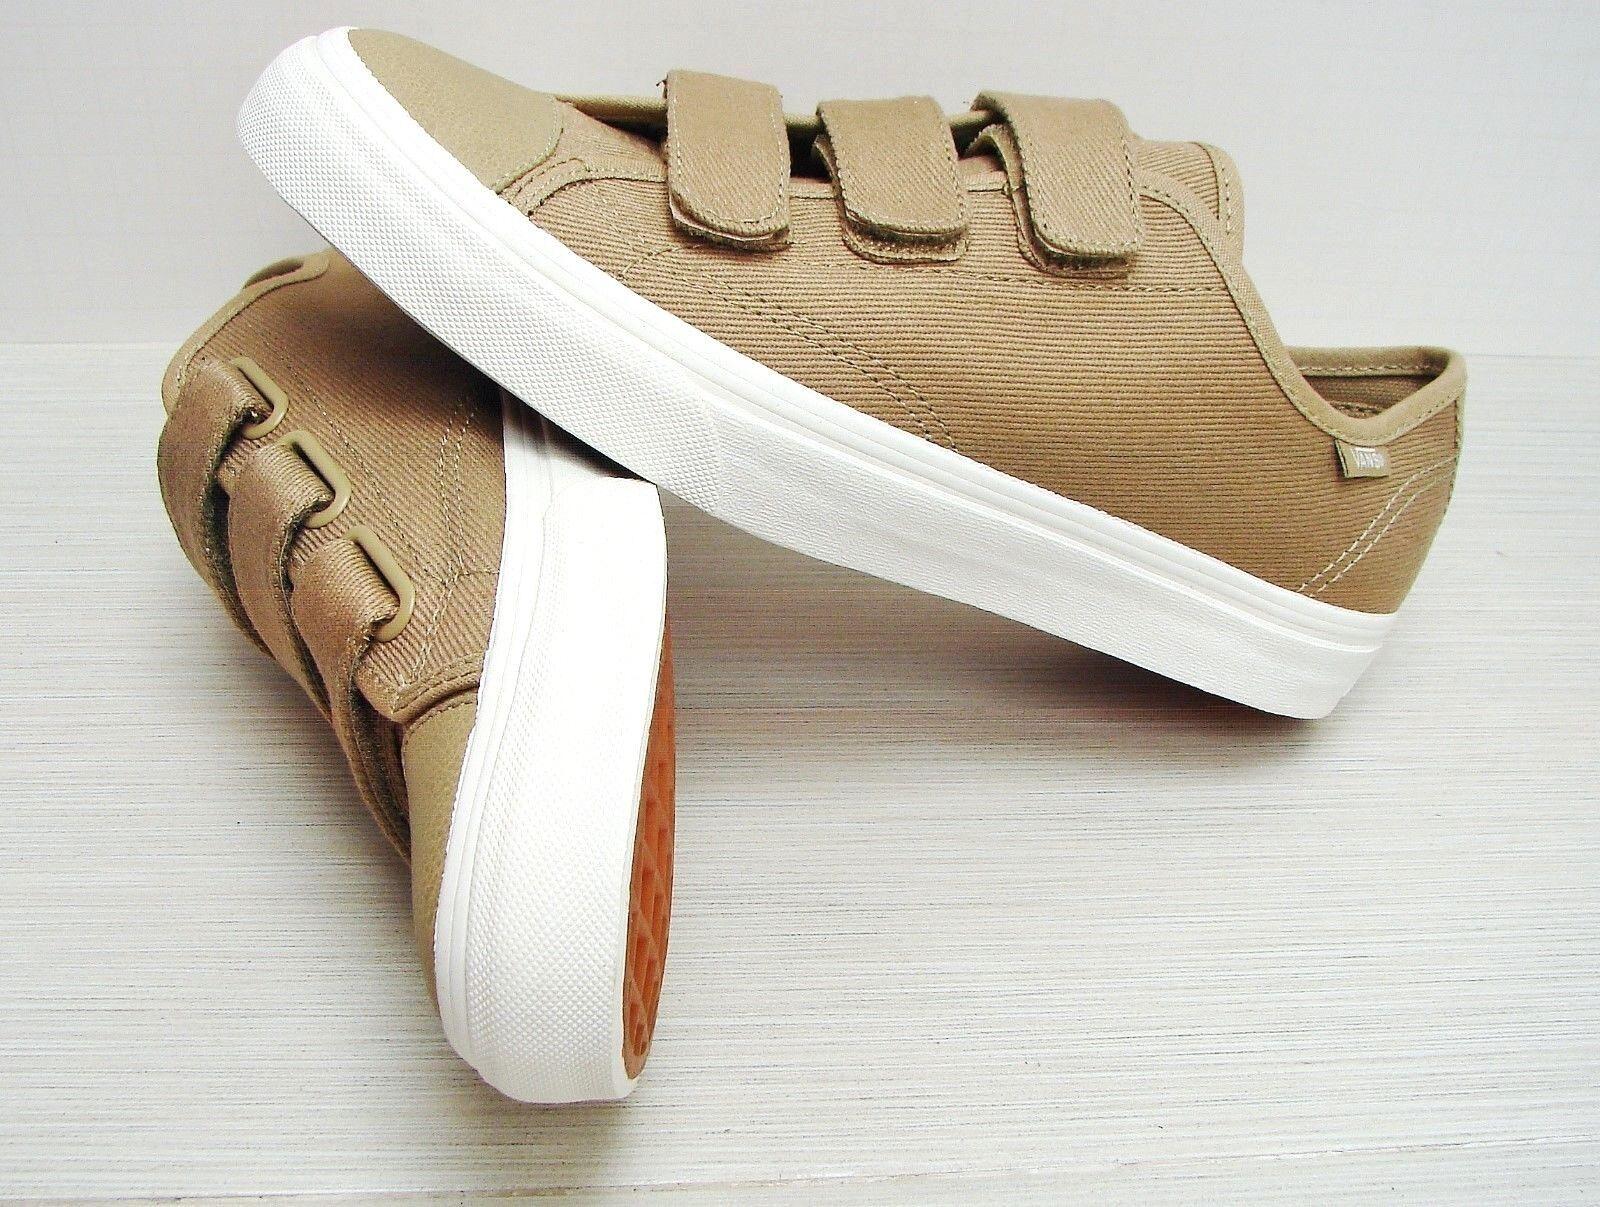 Vans Prison Issue Twill Cornstalk white de white VN000SDJJTO Men's Size 8.5